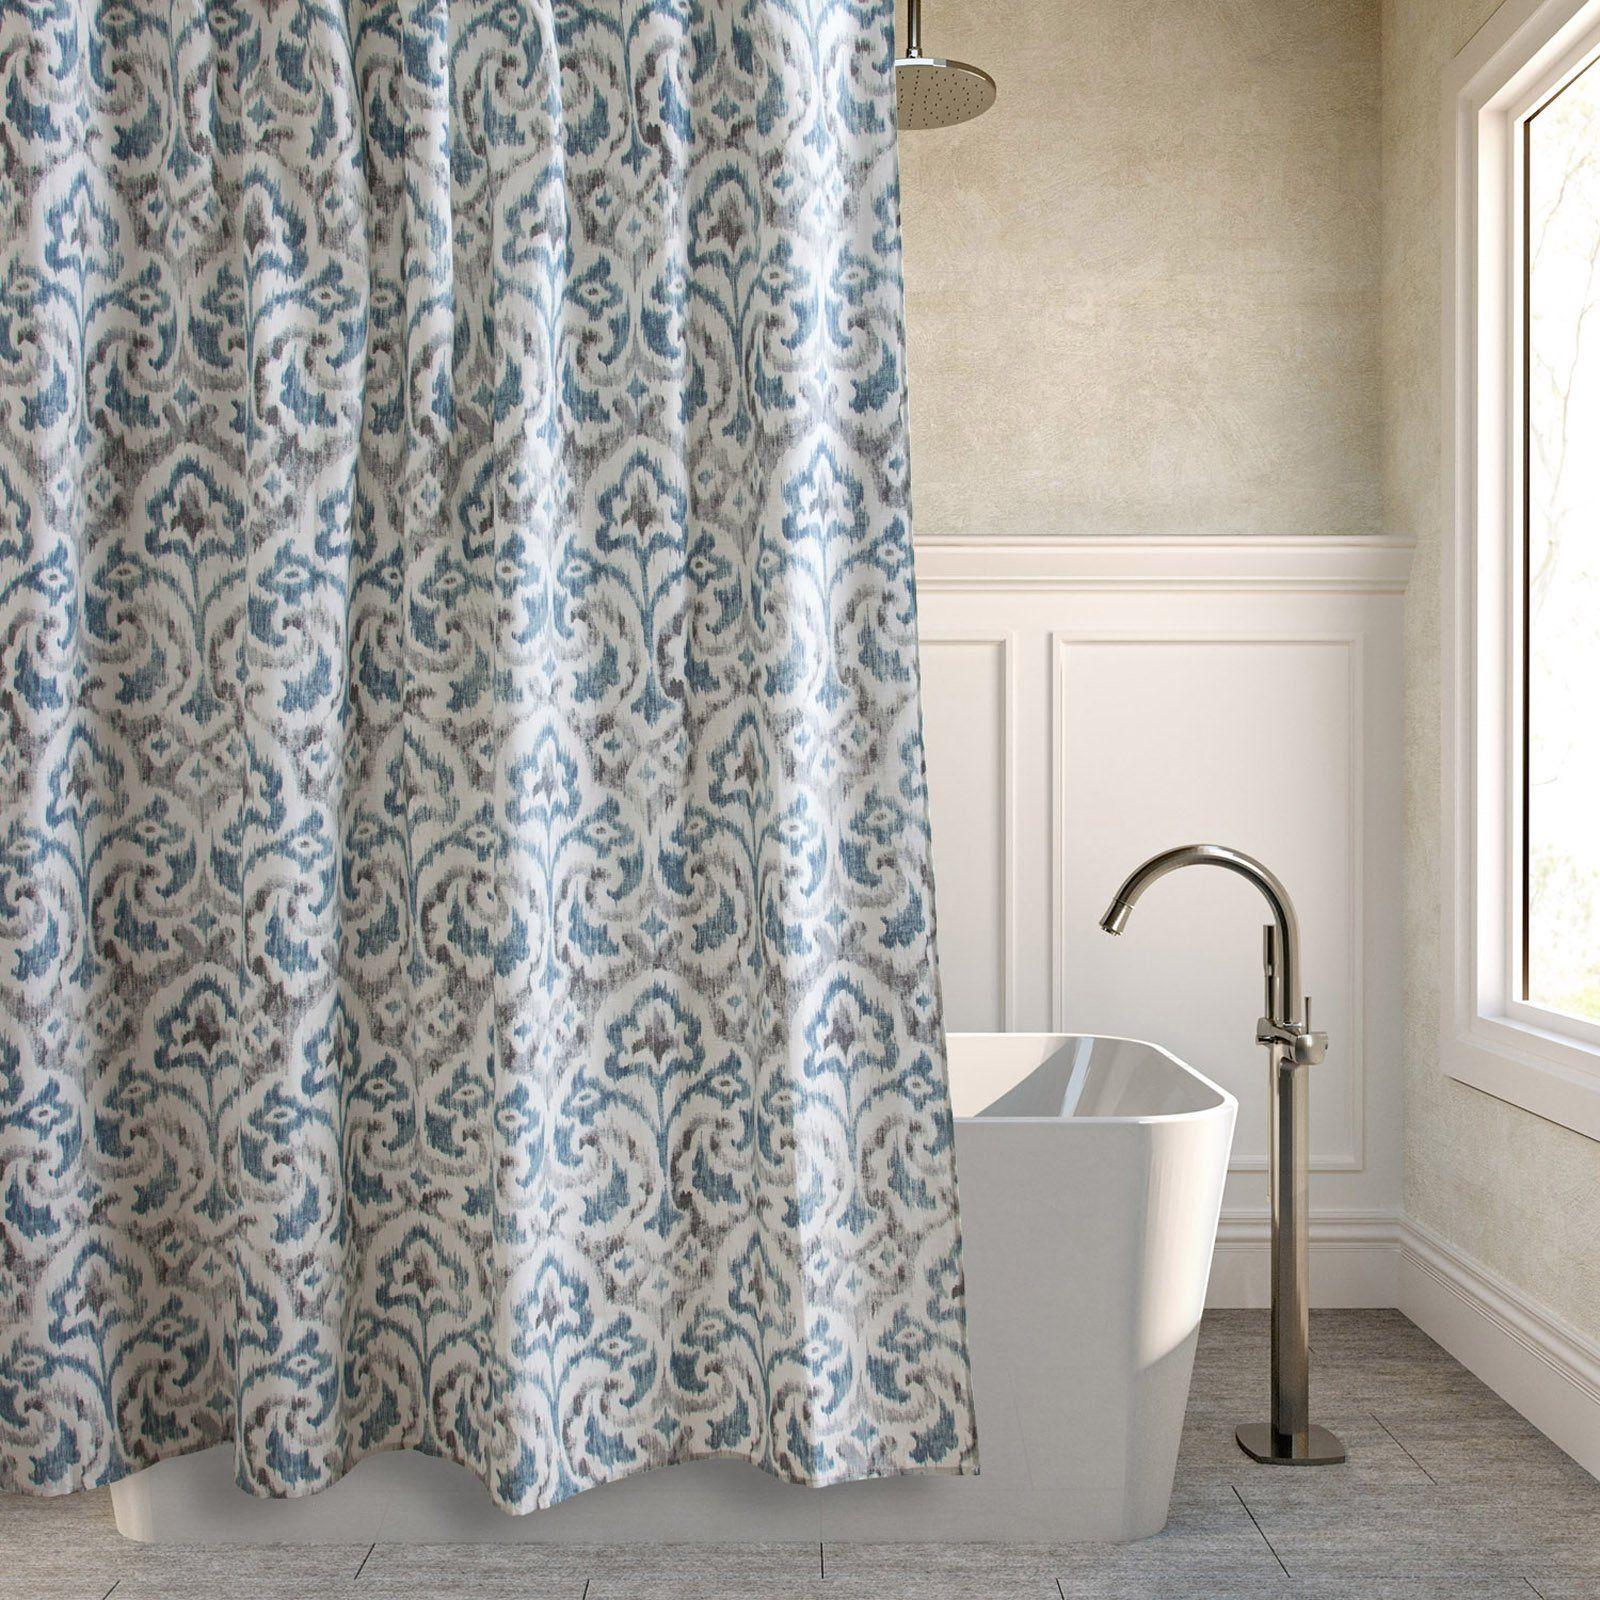 Tommy Bahama Cape Verde Cotton Shower Curtain Www Hayneedle Com Medallion Shower Curtain Cotton Shower Curtain Gray Shower Curtains